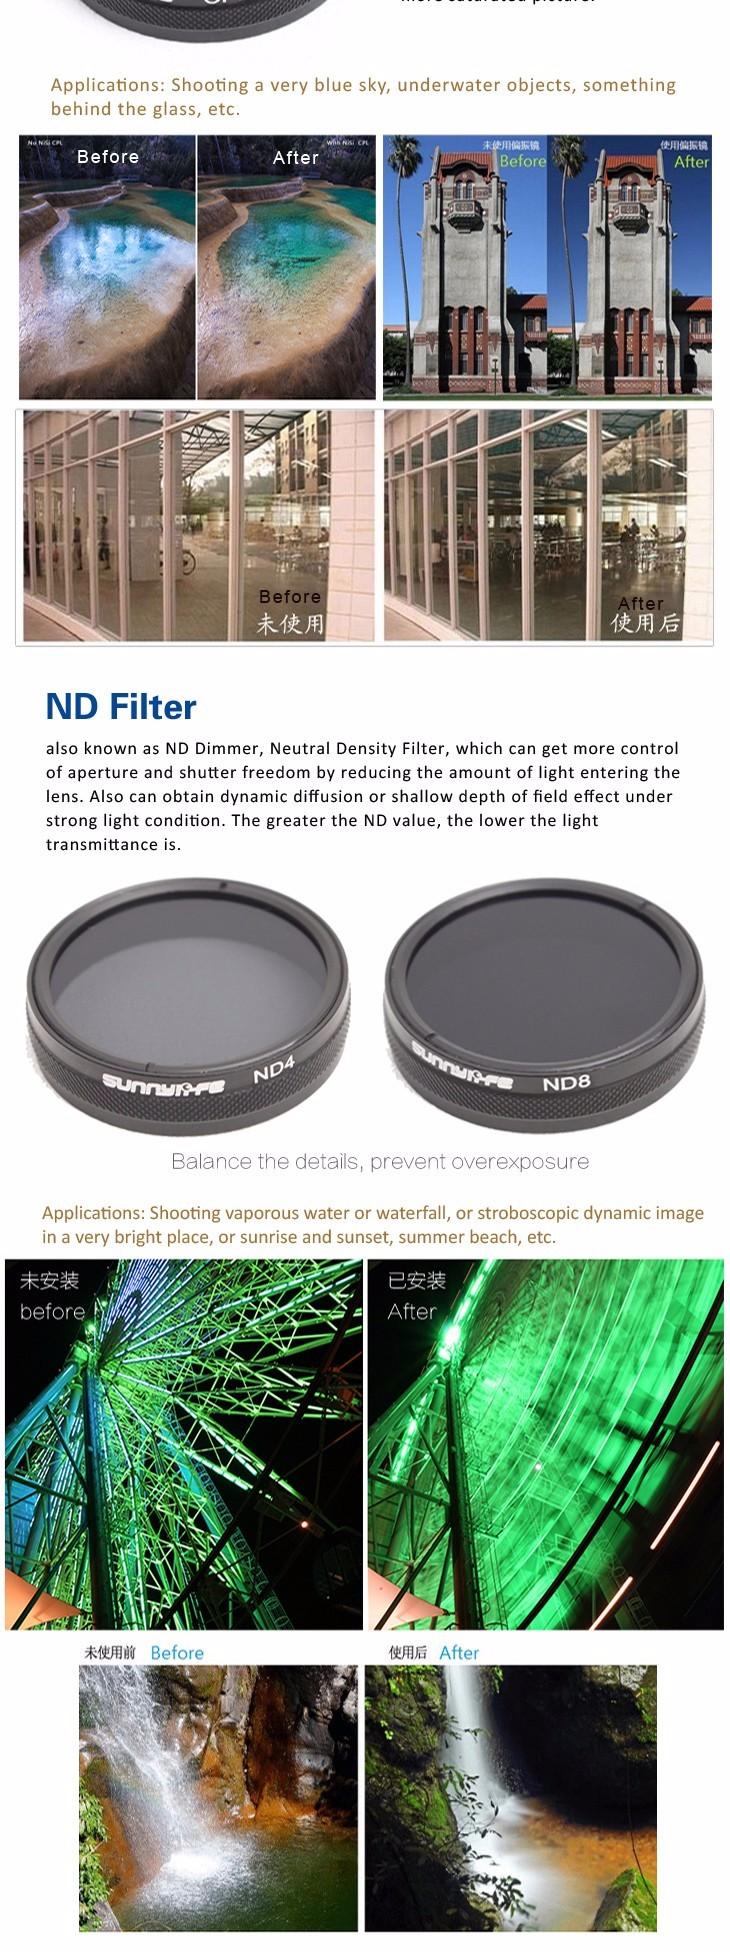 DJI Phantom 3/4 Accessory CPL Filter Circular Polarizer Filter for Phantom 4/3 Professional & Advanced & Standard free shipping